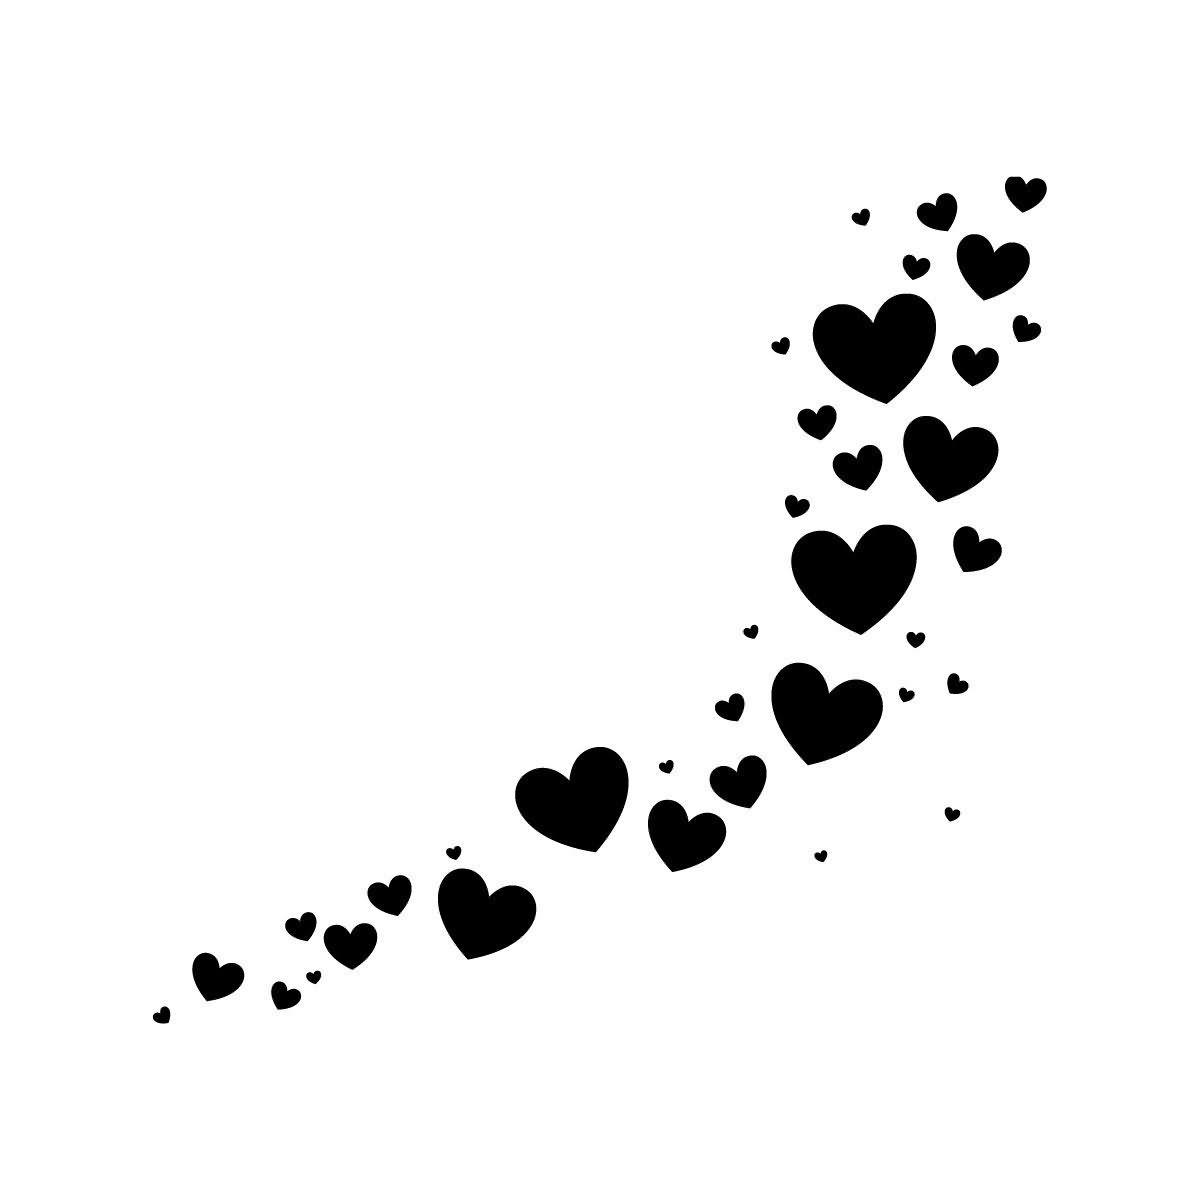 Free Download Black Heart White Background Pic Imagefullycom 1200x1200 For Your Desktop Mobile Tablet Explore 63 Black And White Heart Background Black White Hearts Wallpaper